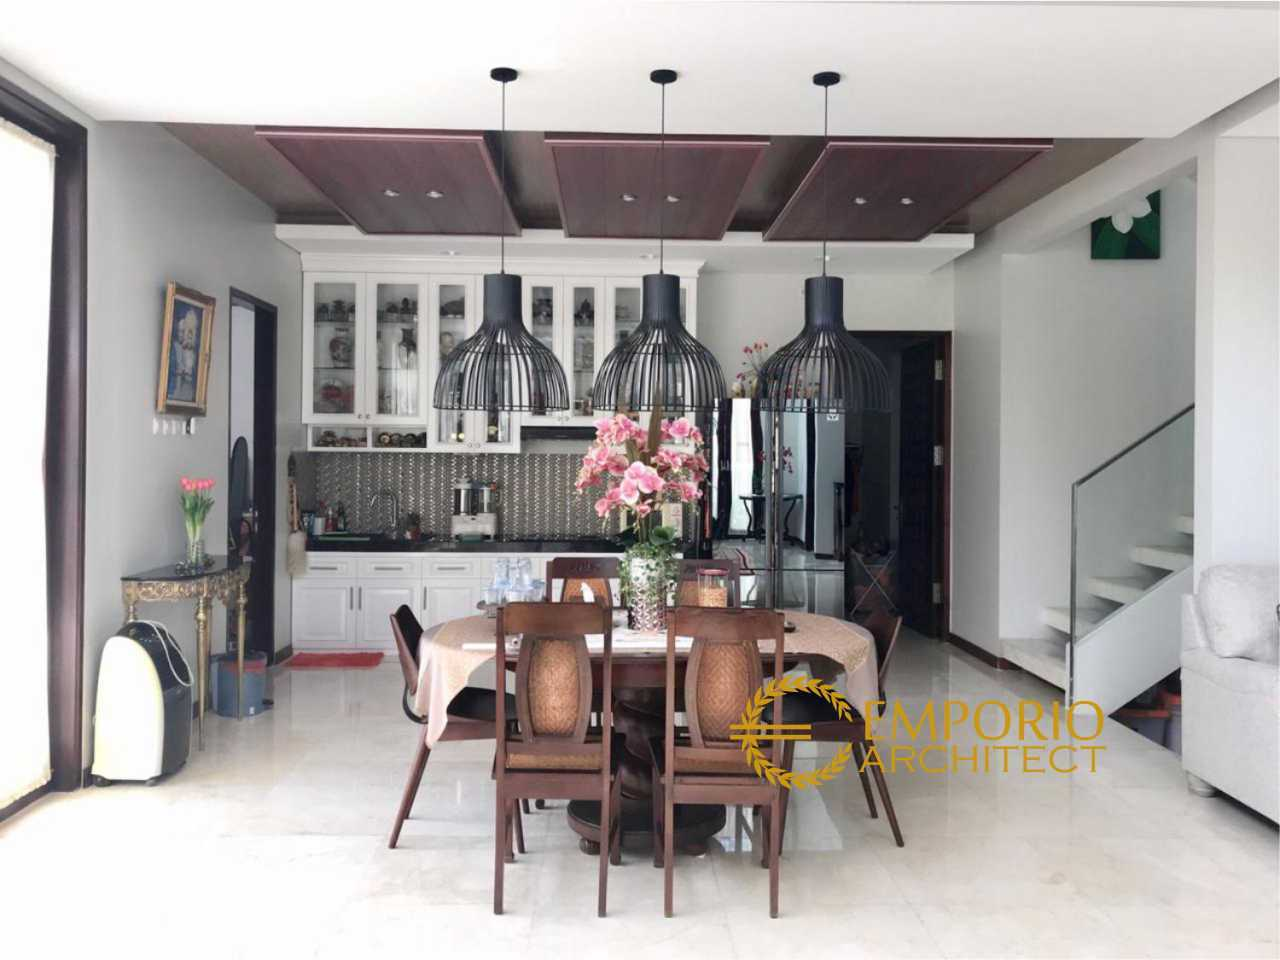 Emporio Architect Jasa Arsitek Bintaro Hasil Konstruksi Rumah Villa Bali Tropis 268 @ Bintaro, Jakarta Selatan Bintaro, Kec. Pesanggrahan, Kota Jakarta Selatan, Daerah Khusus Ibukota Jakarta, Indonesia Bintaro, Kec. Pesanggrahan, Kota Jakarta Selatan, Daerah Khusus Ibukota Jakarta, Indonesia Emporio-Architect-Jasa-Arsitek-Bintaro-Hasil-Konstruksi-Rumah-Villa-Bali-Tropis-268-Bintaro-Jakarta-Selatan  92359